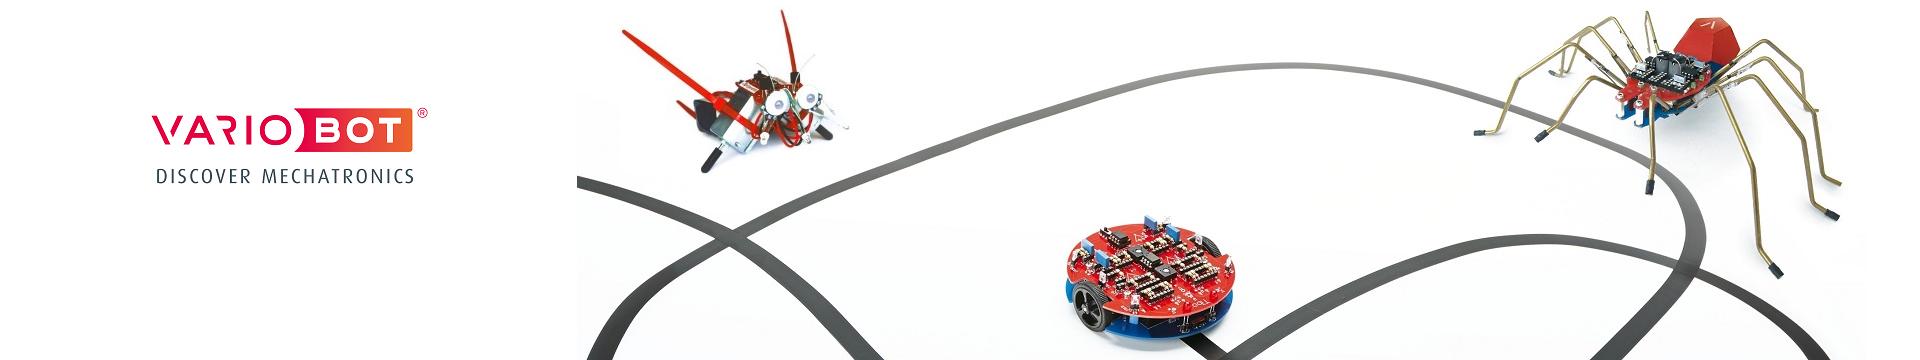 Varikabi - Variable Mini-Bot as a Plug-in Kit